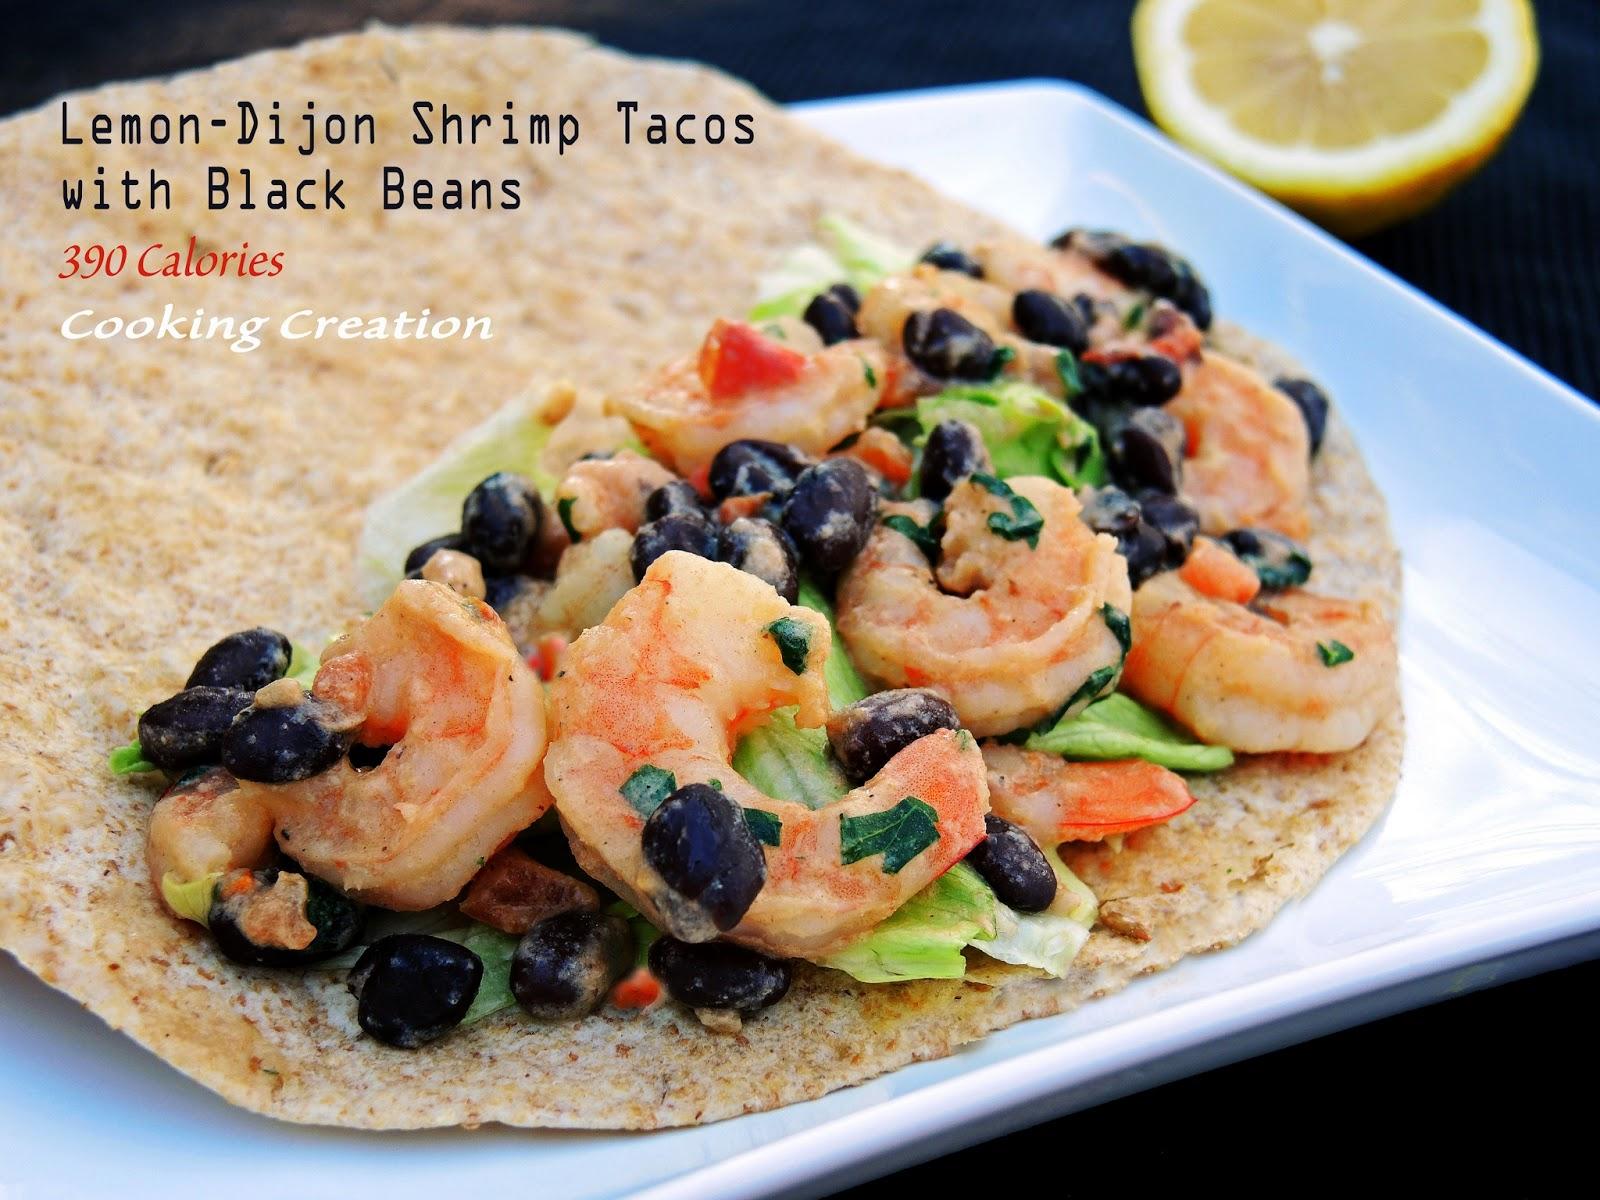 Cooking Creation: Lemon-Dijon Shrimp Tacos with Black Beans